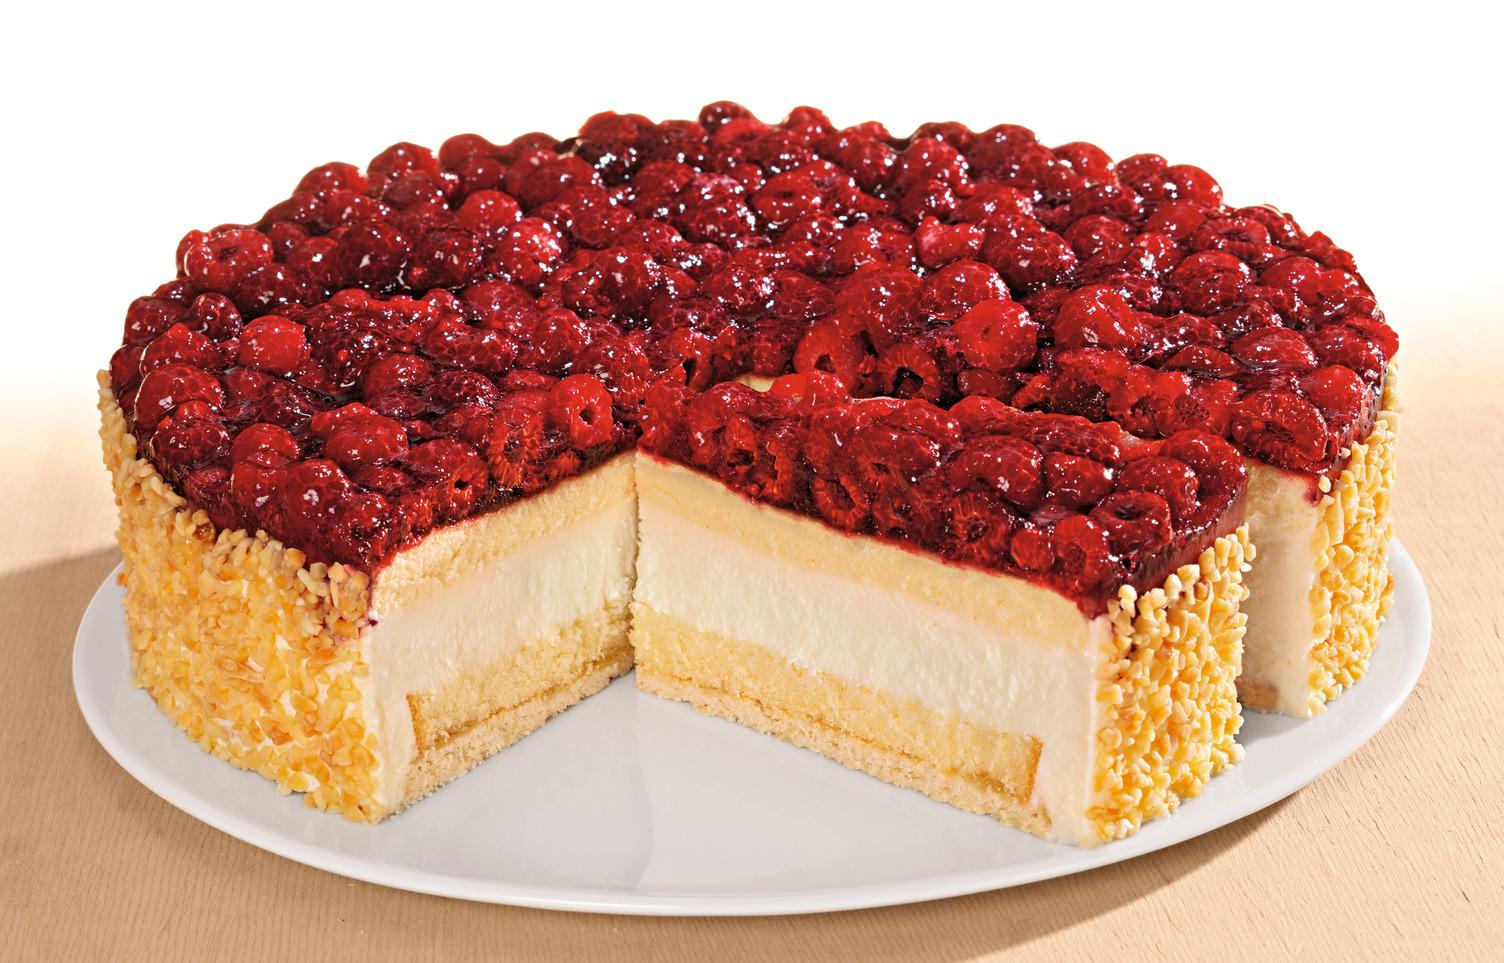 NESTLE SCHOELLER Himbeer-Käse-Sahne-Torte 2500 g